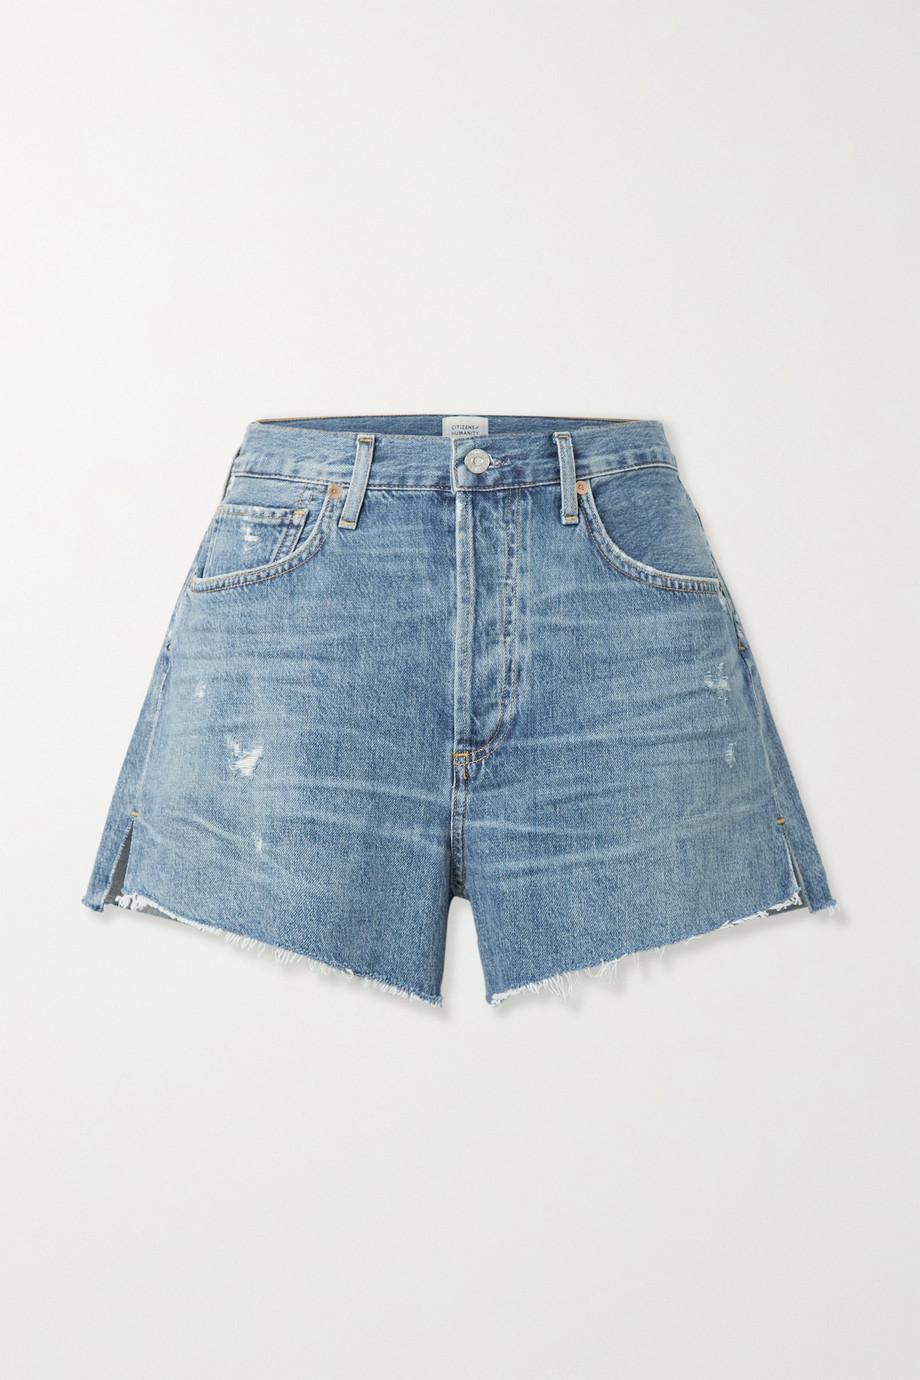 Citizens of Humanity Marlow distressed organic denim shorts